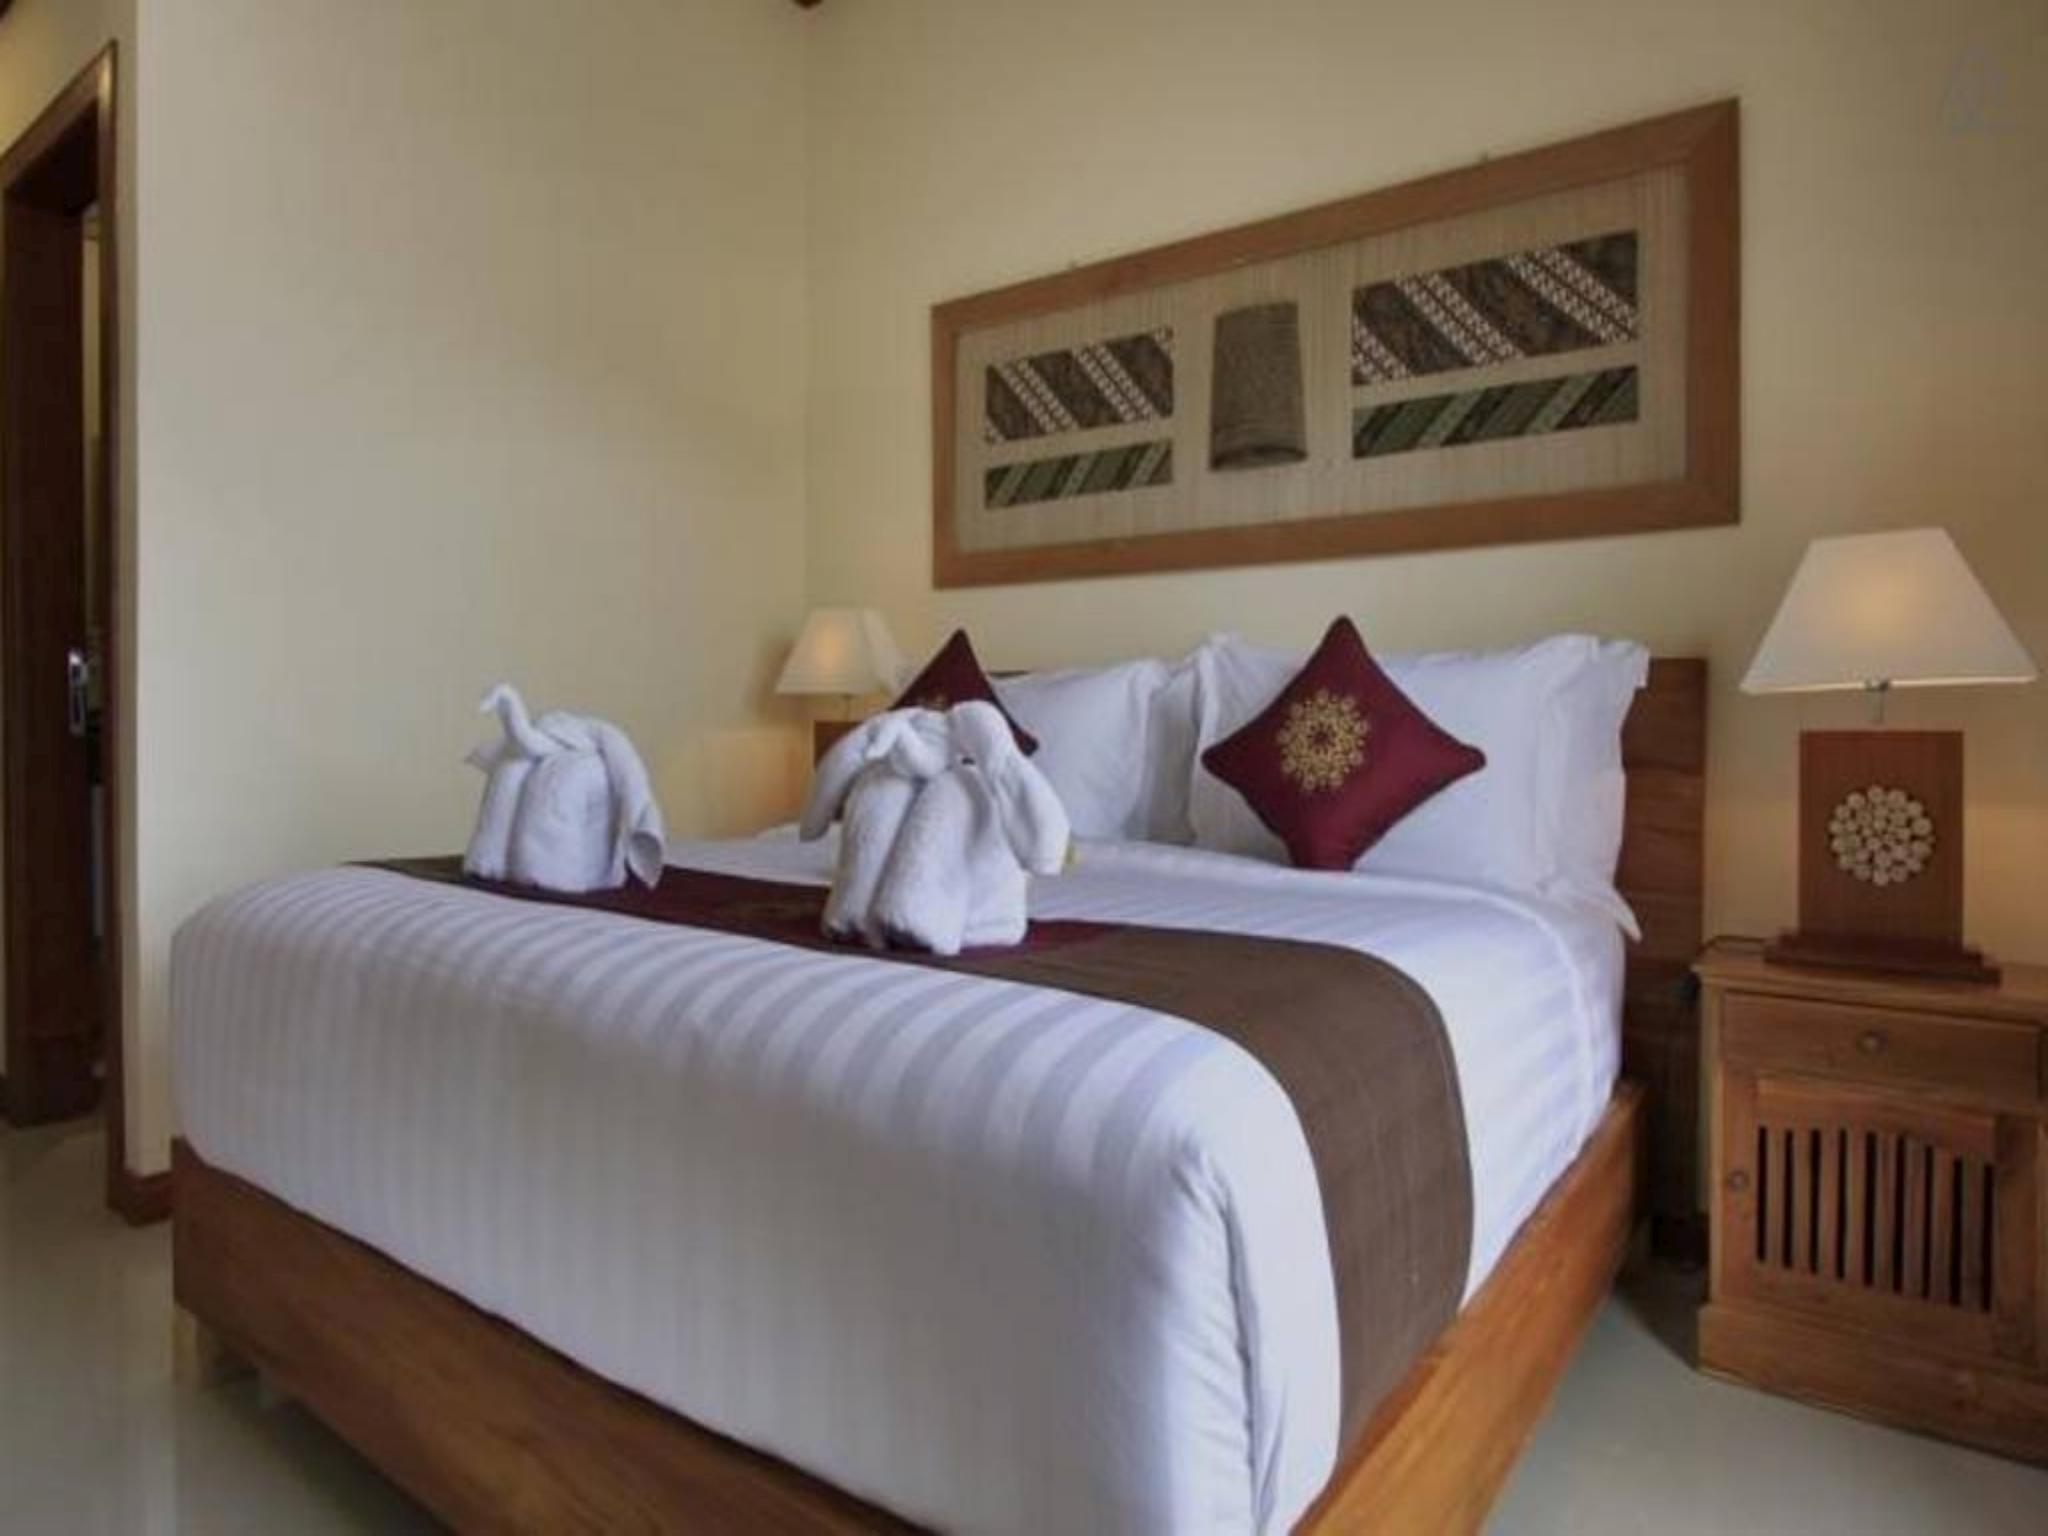 Price 1 BR Luxury Suites Rooms Ricefield View at Ubud